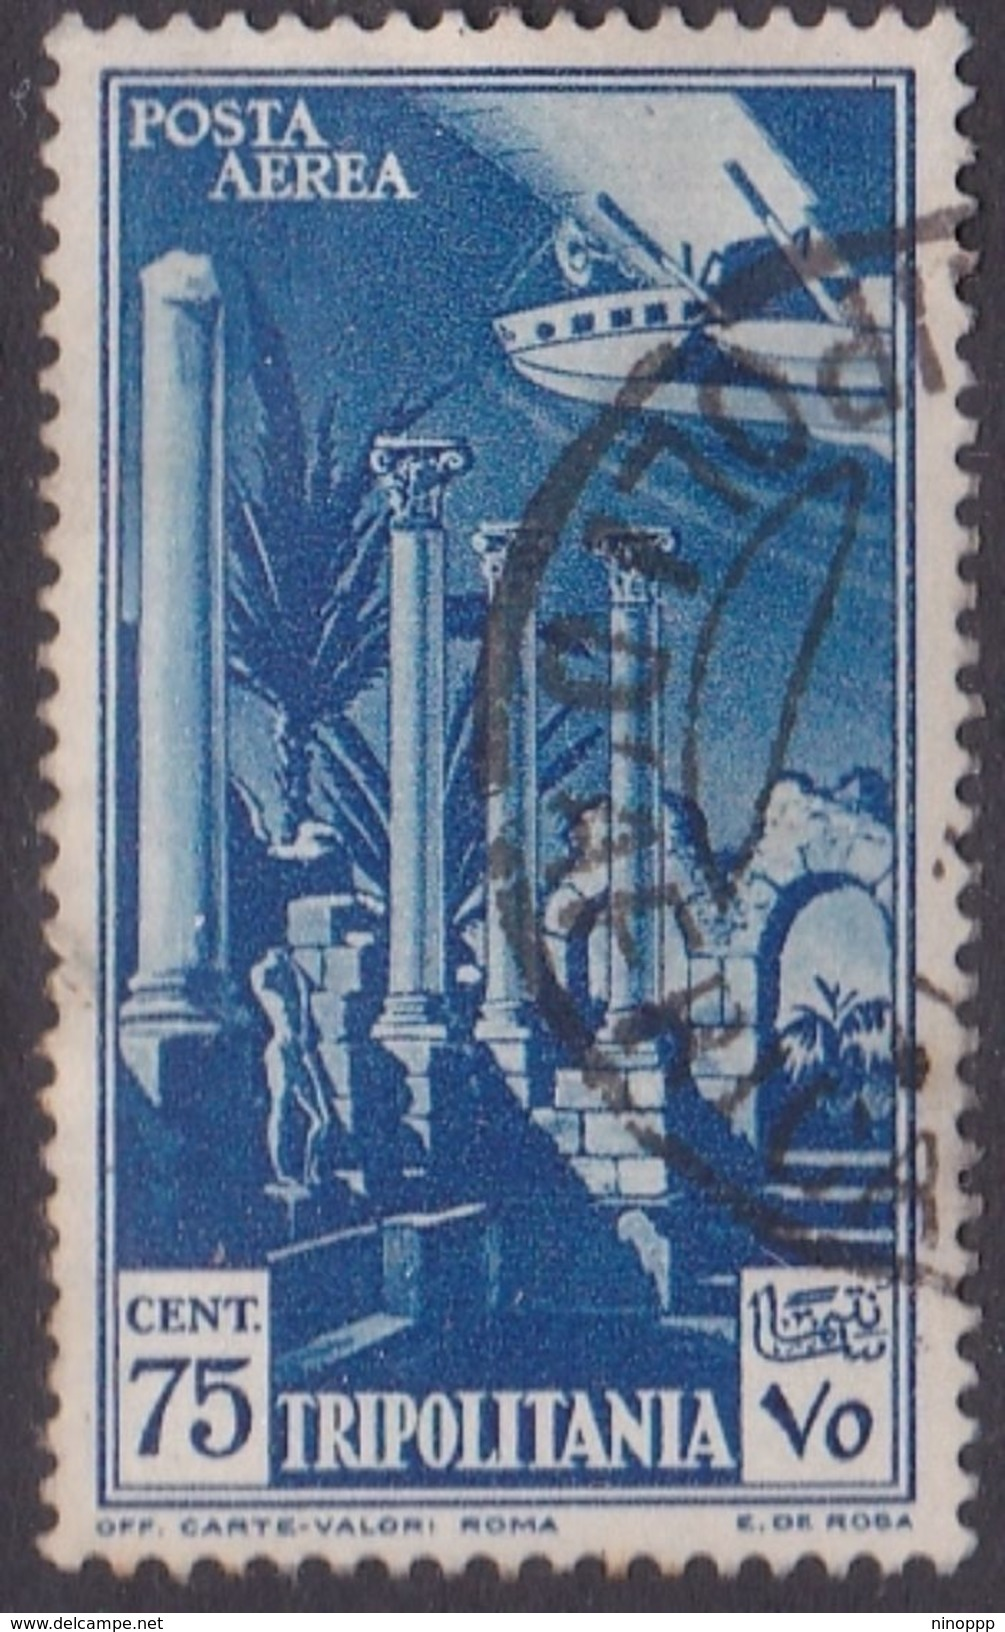 Italy-Colonies And Territories-Tripolitania A11  1931 Air Leptis Magna Ruines,75c Blue,used - Tripolitania